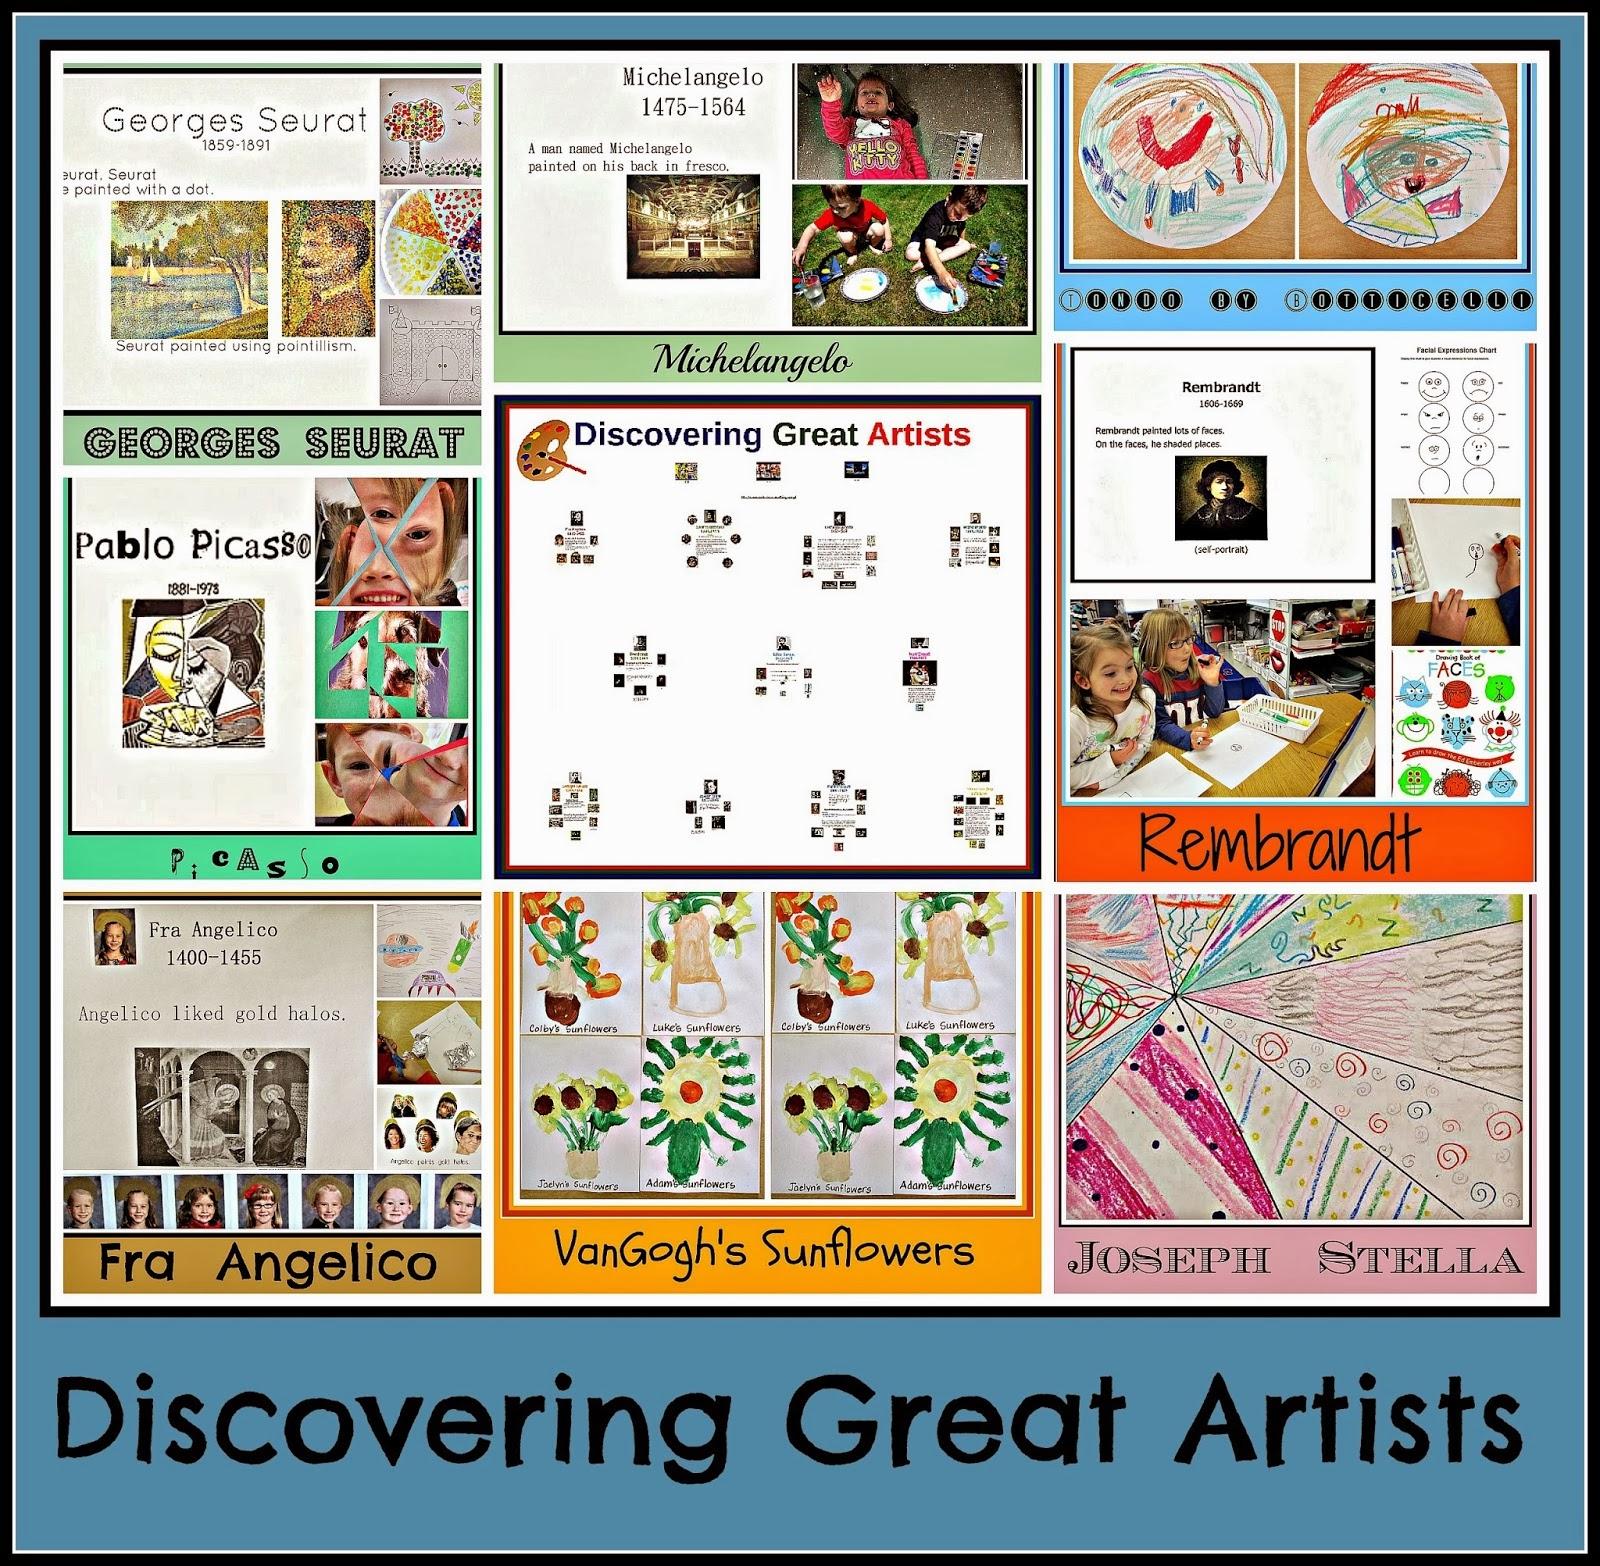 http://prekandksharing.blogspot.com/2014/02/discovering-great-artists.html